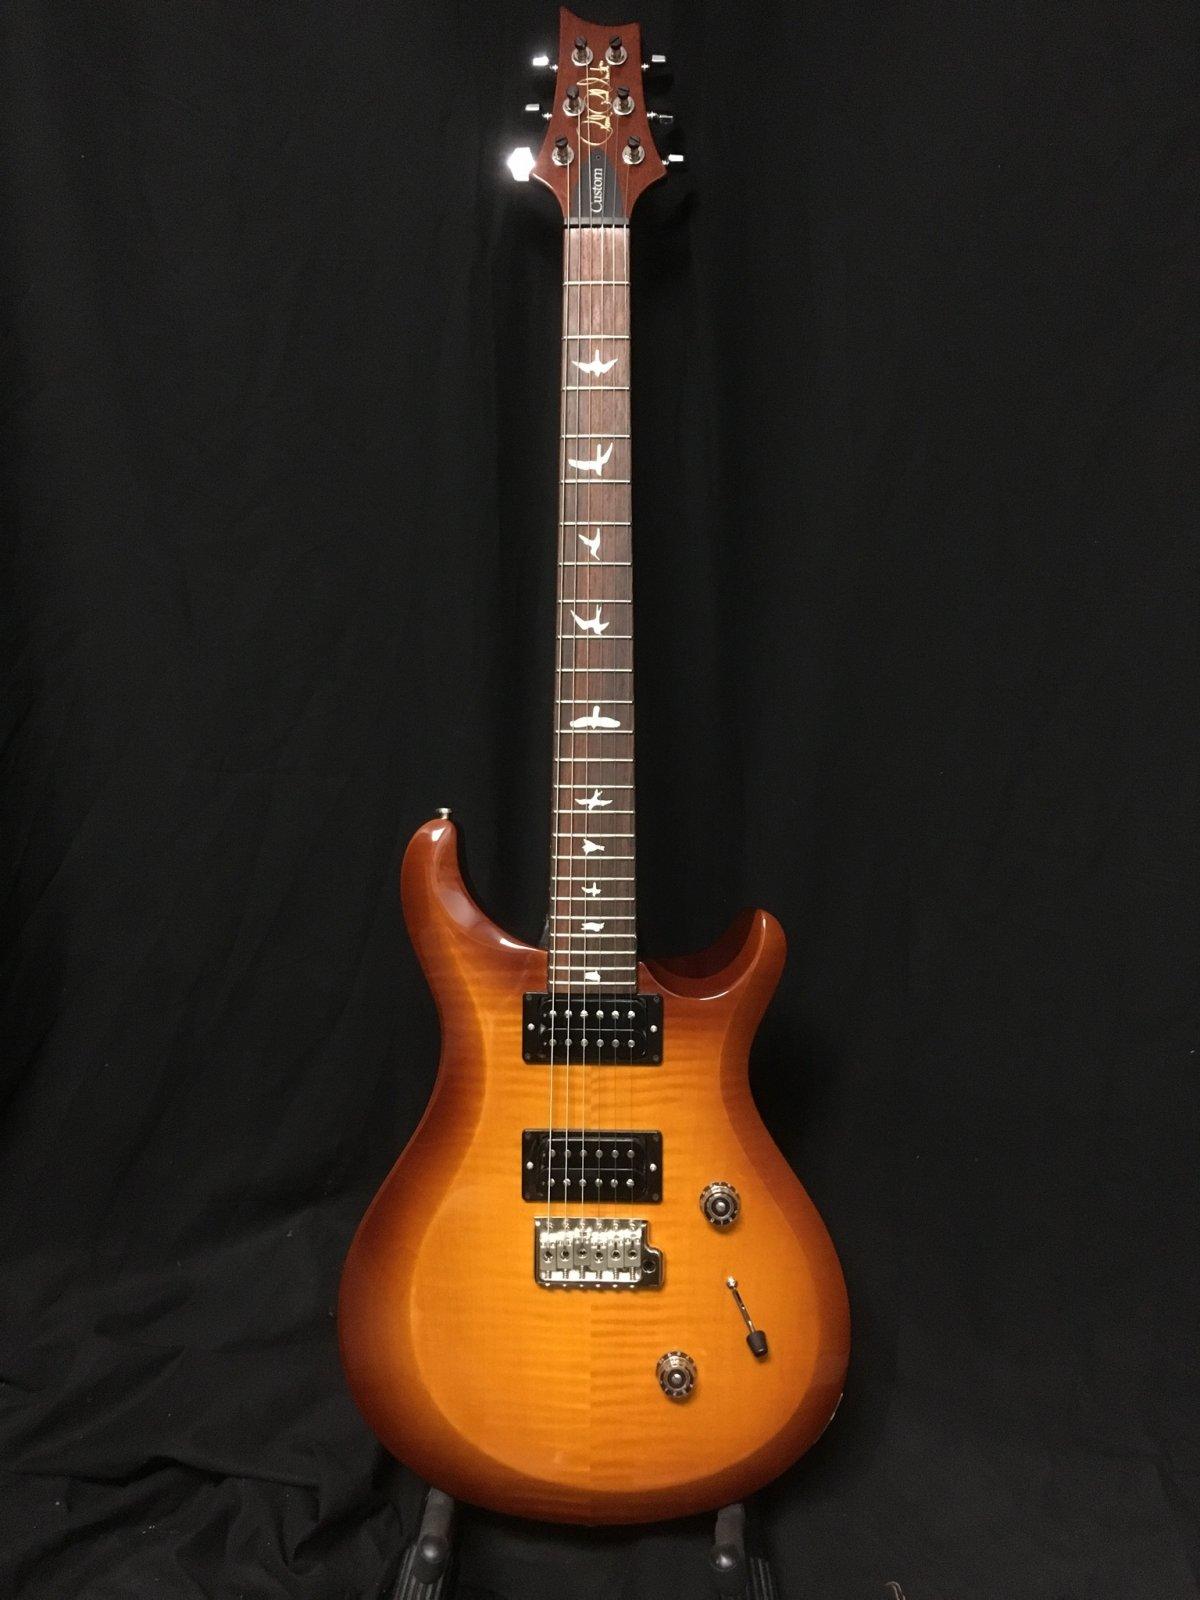 PRS S2 Custom 24 - Violin Amber Sunburst - 2018